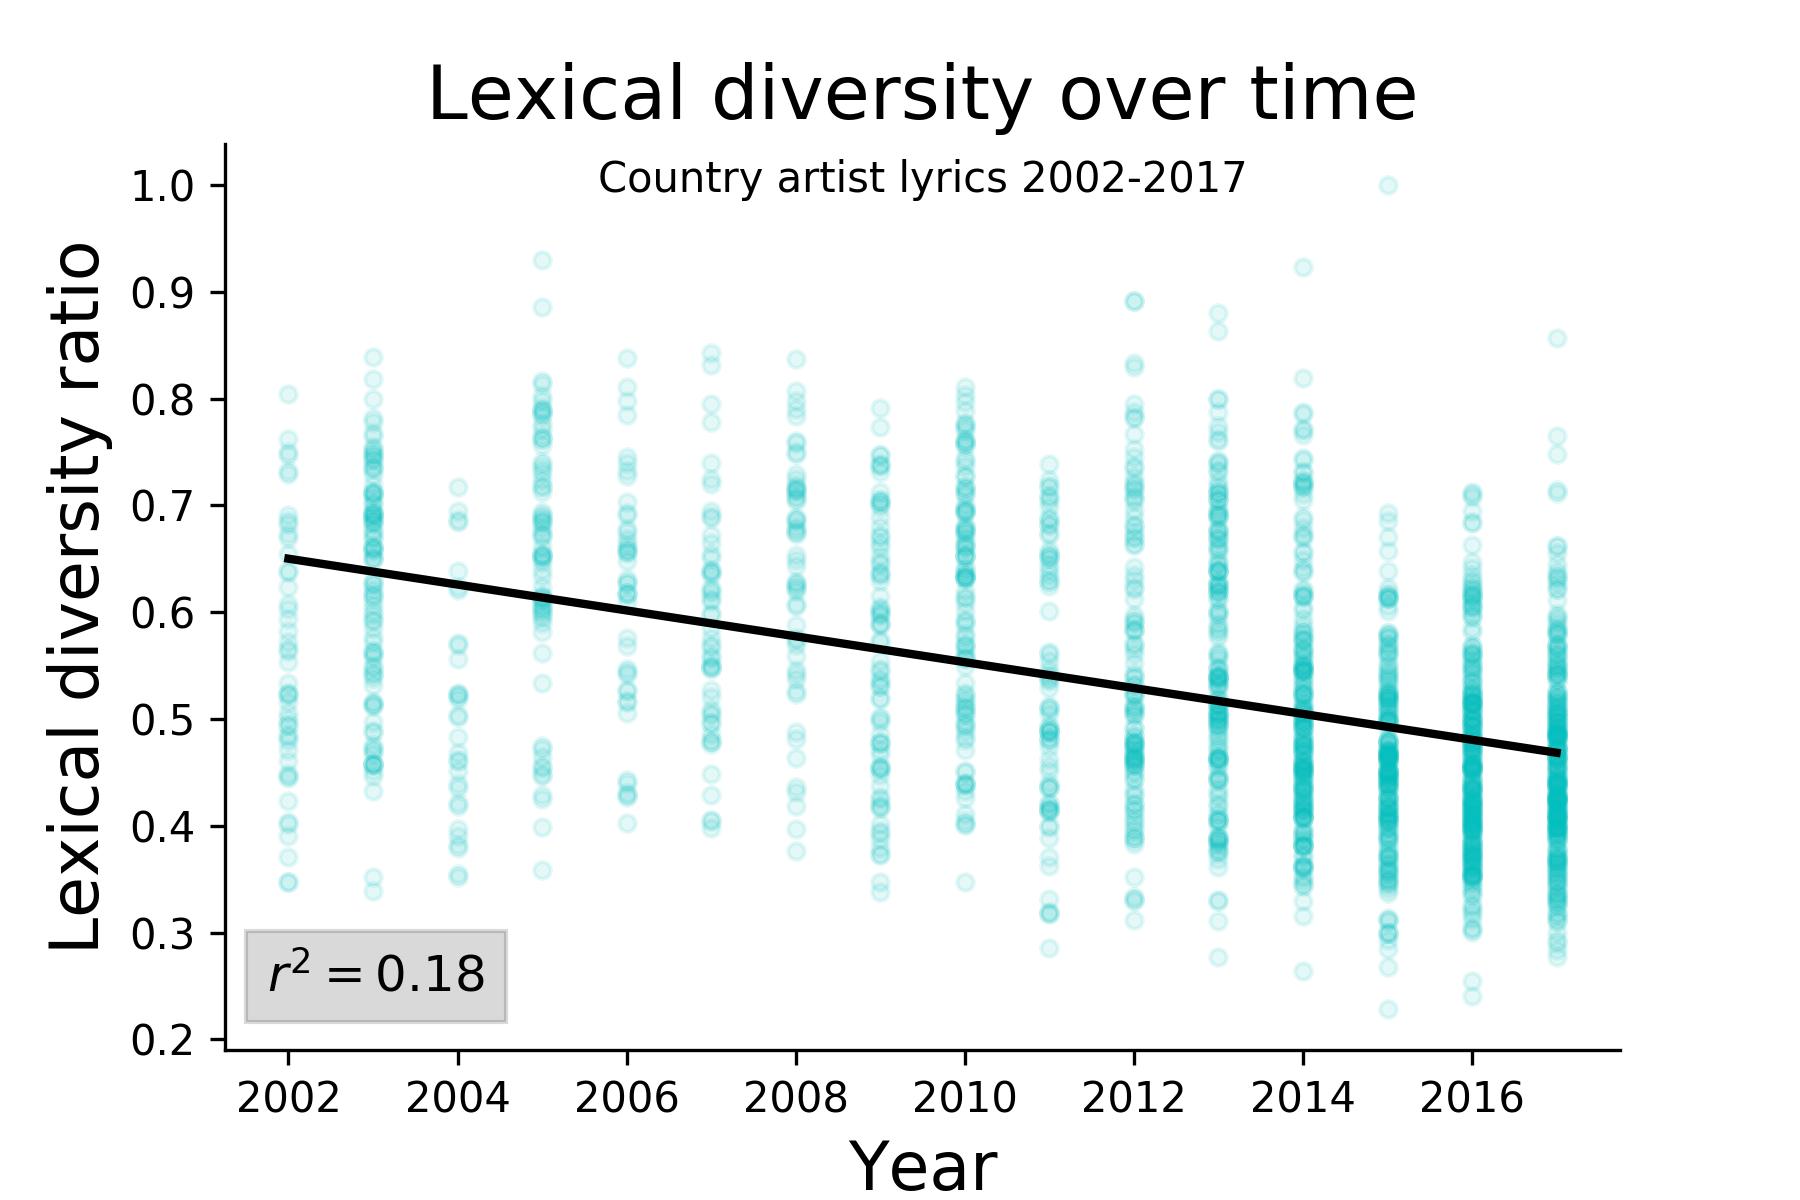 lexical_diversity